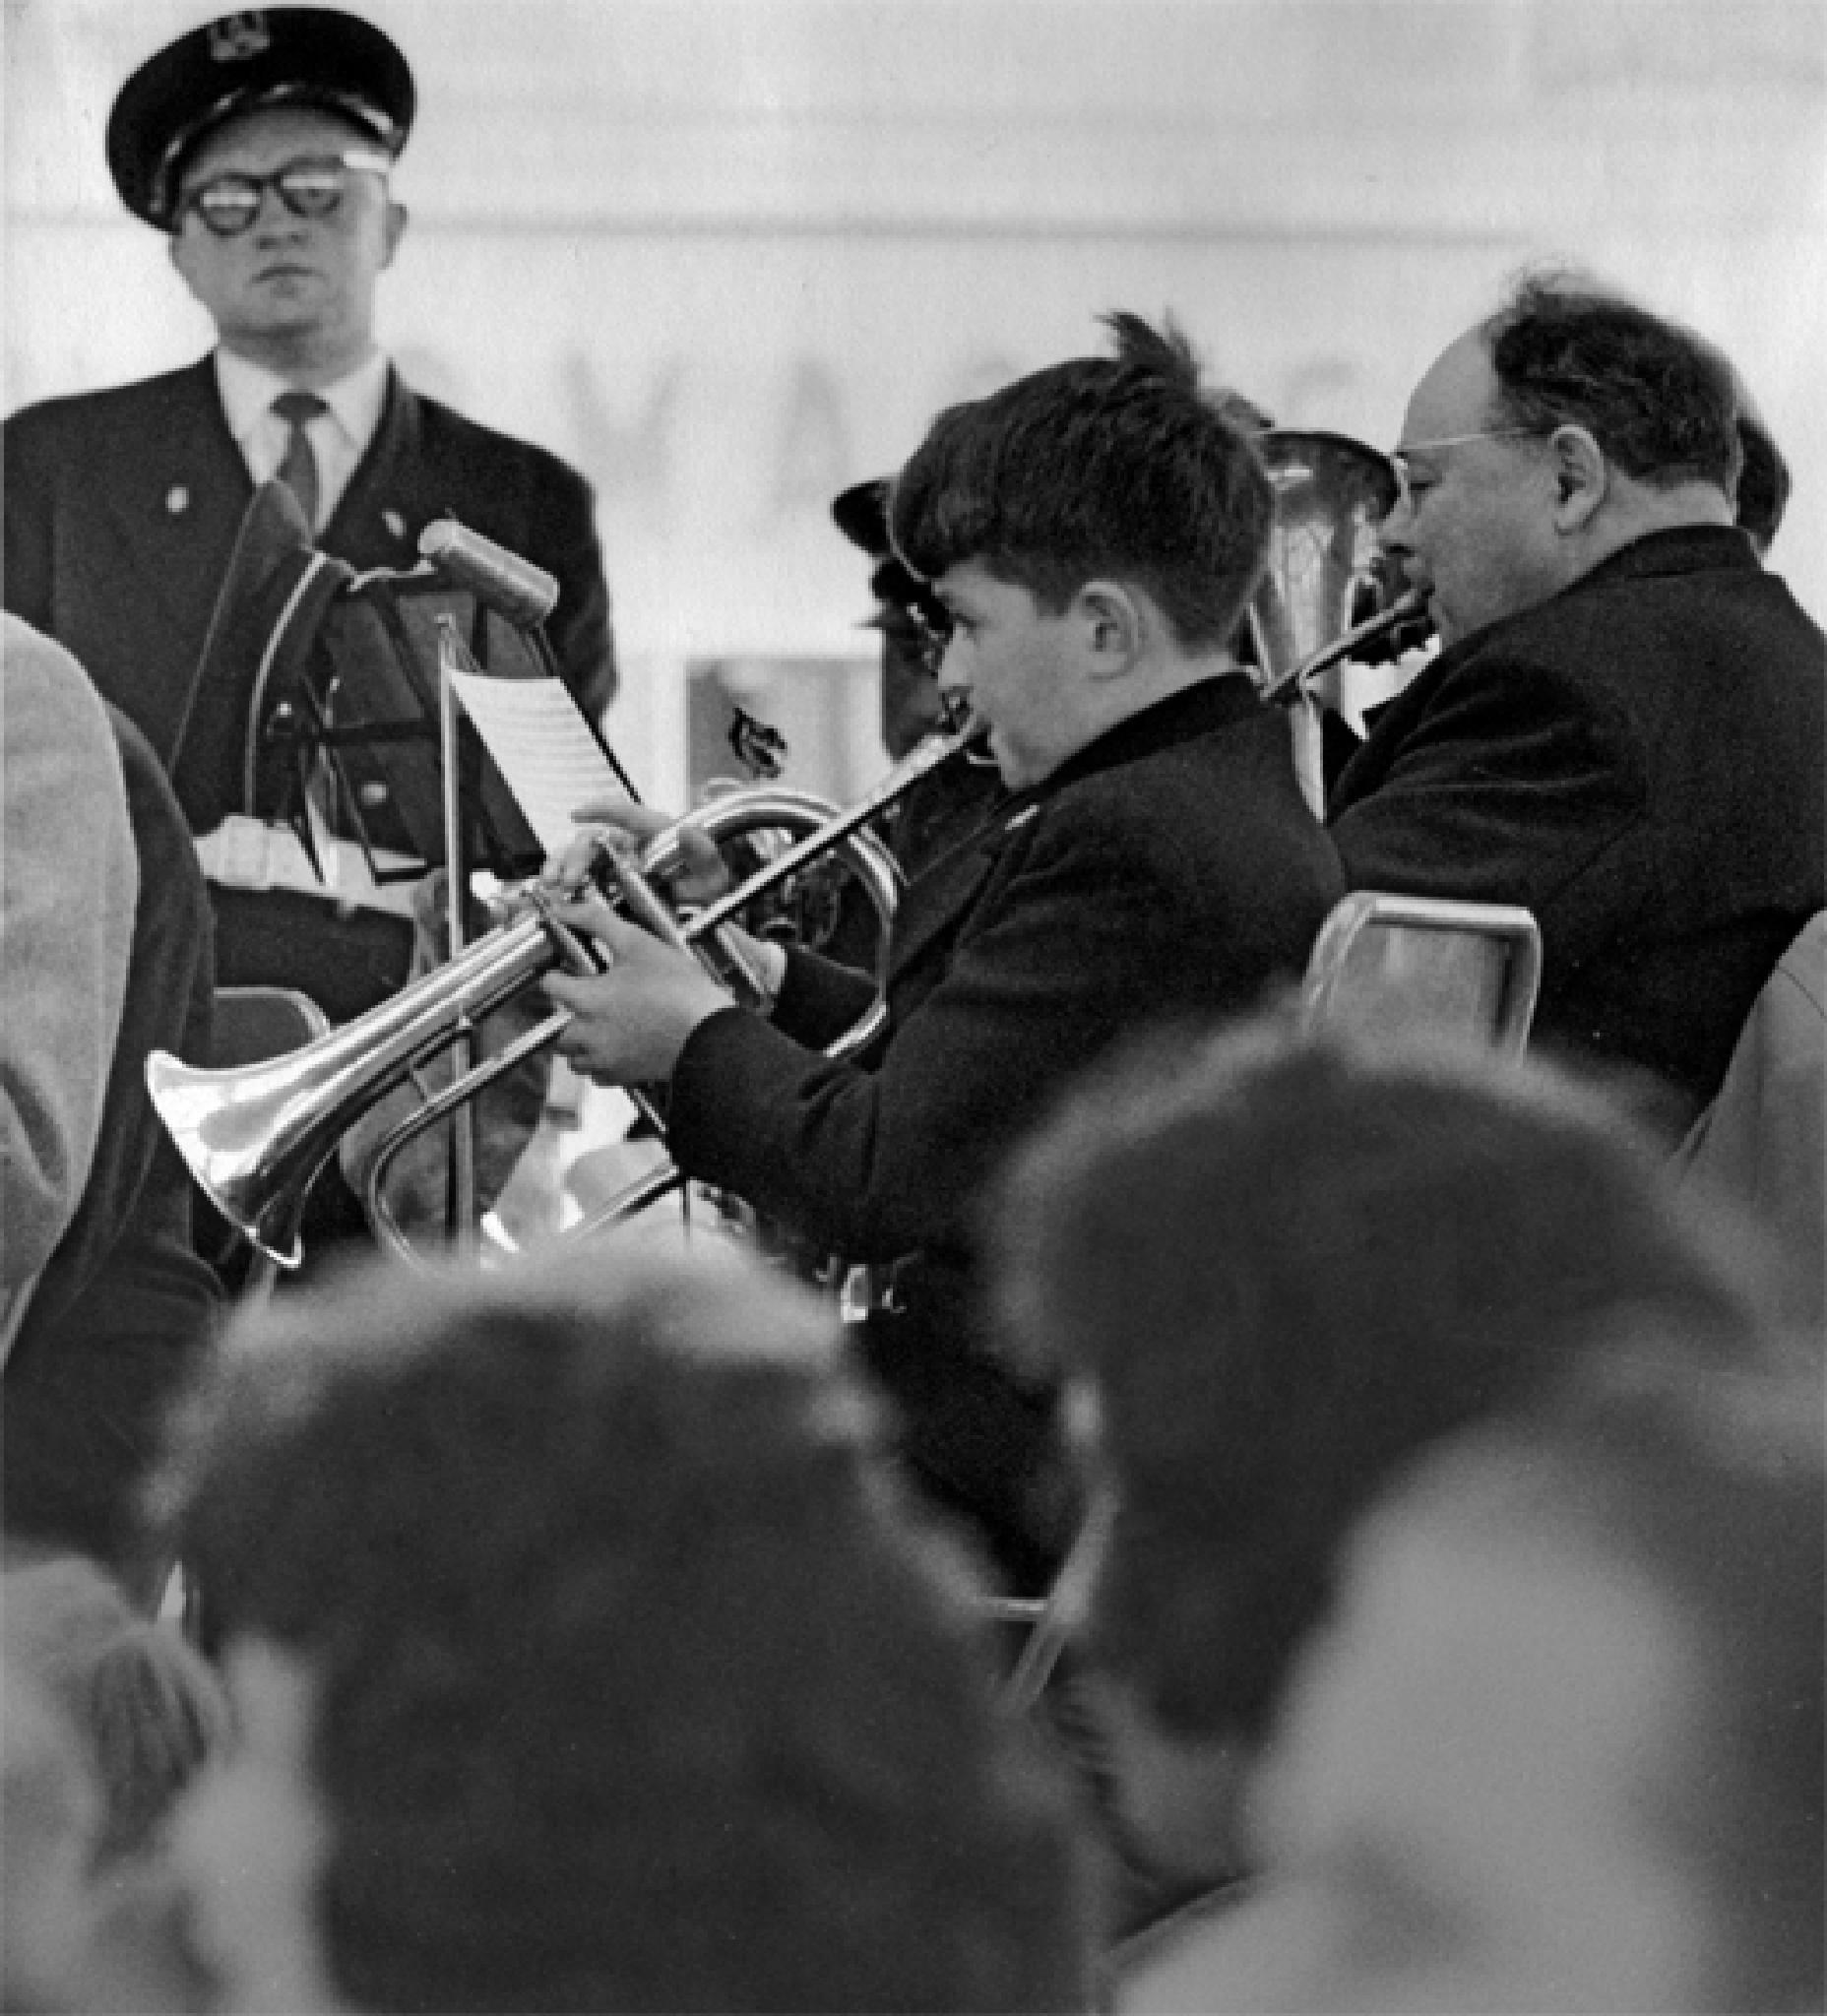 Trumpet boy by Art Resnick